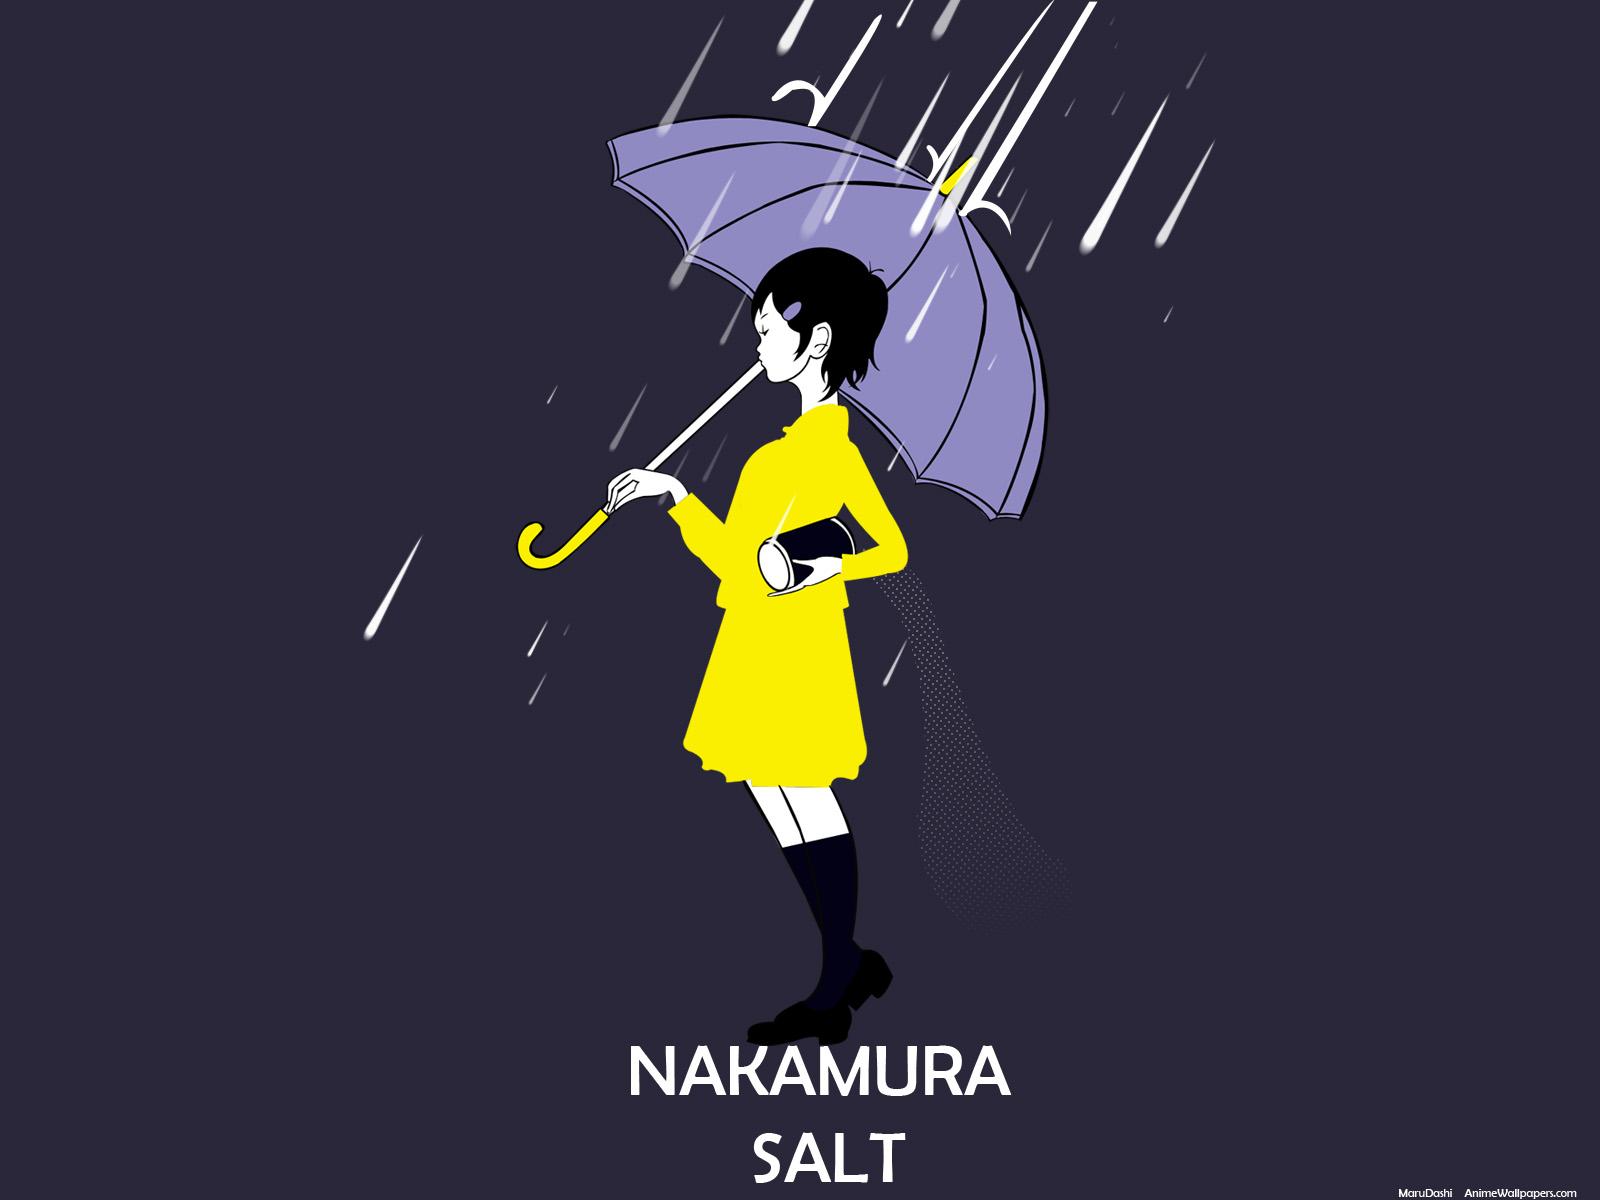 Miscellaneous Anime Wallpaper # 7